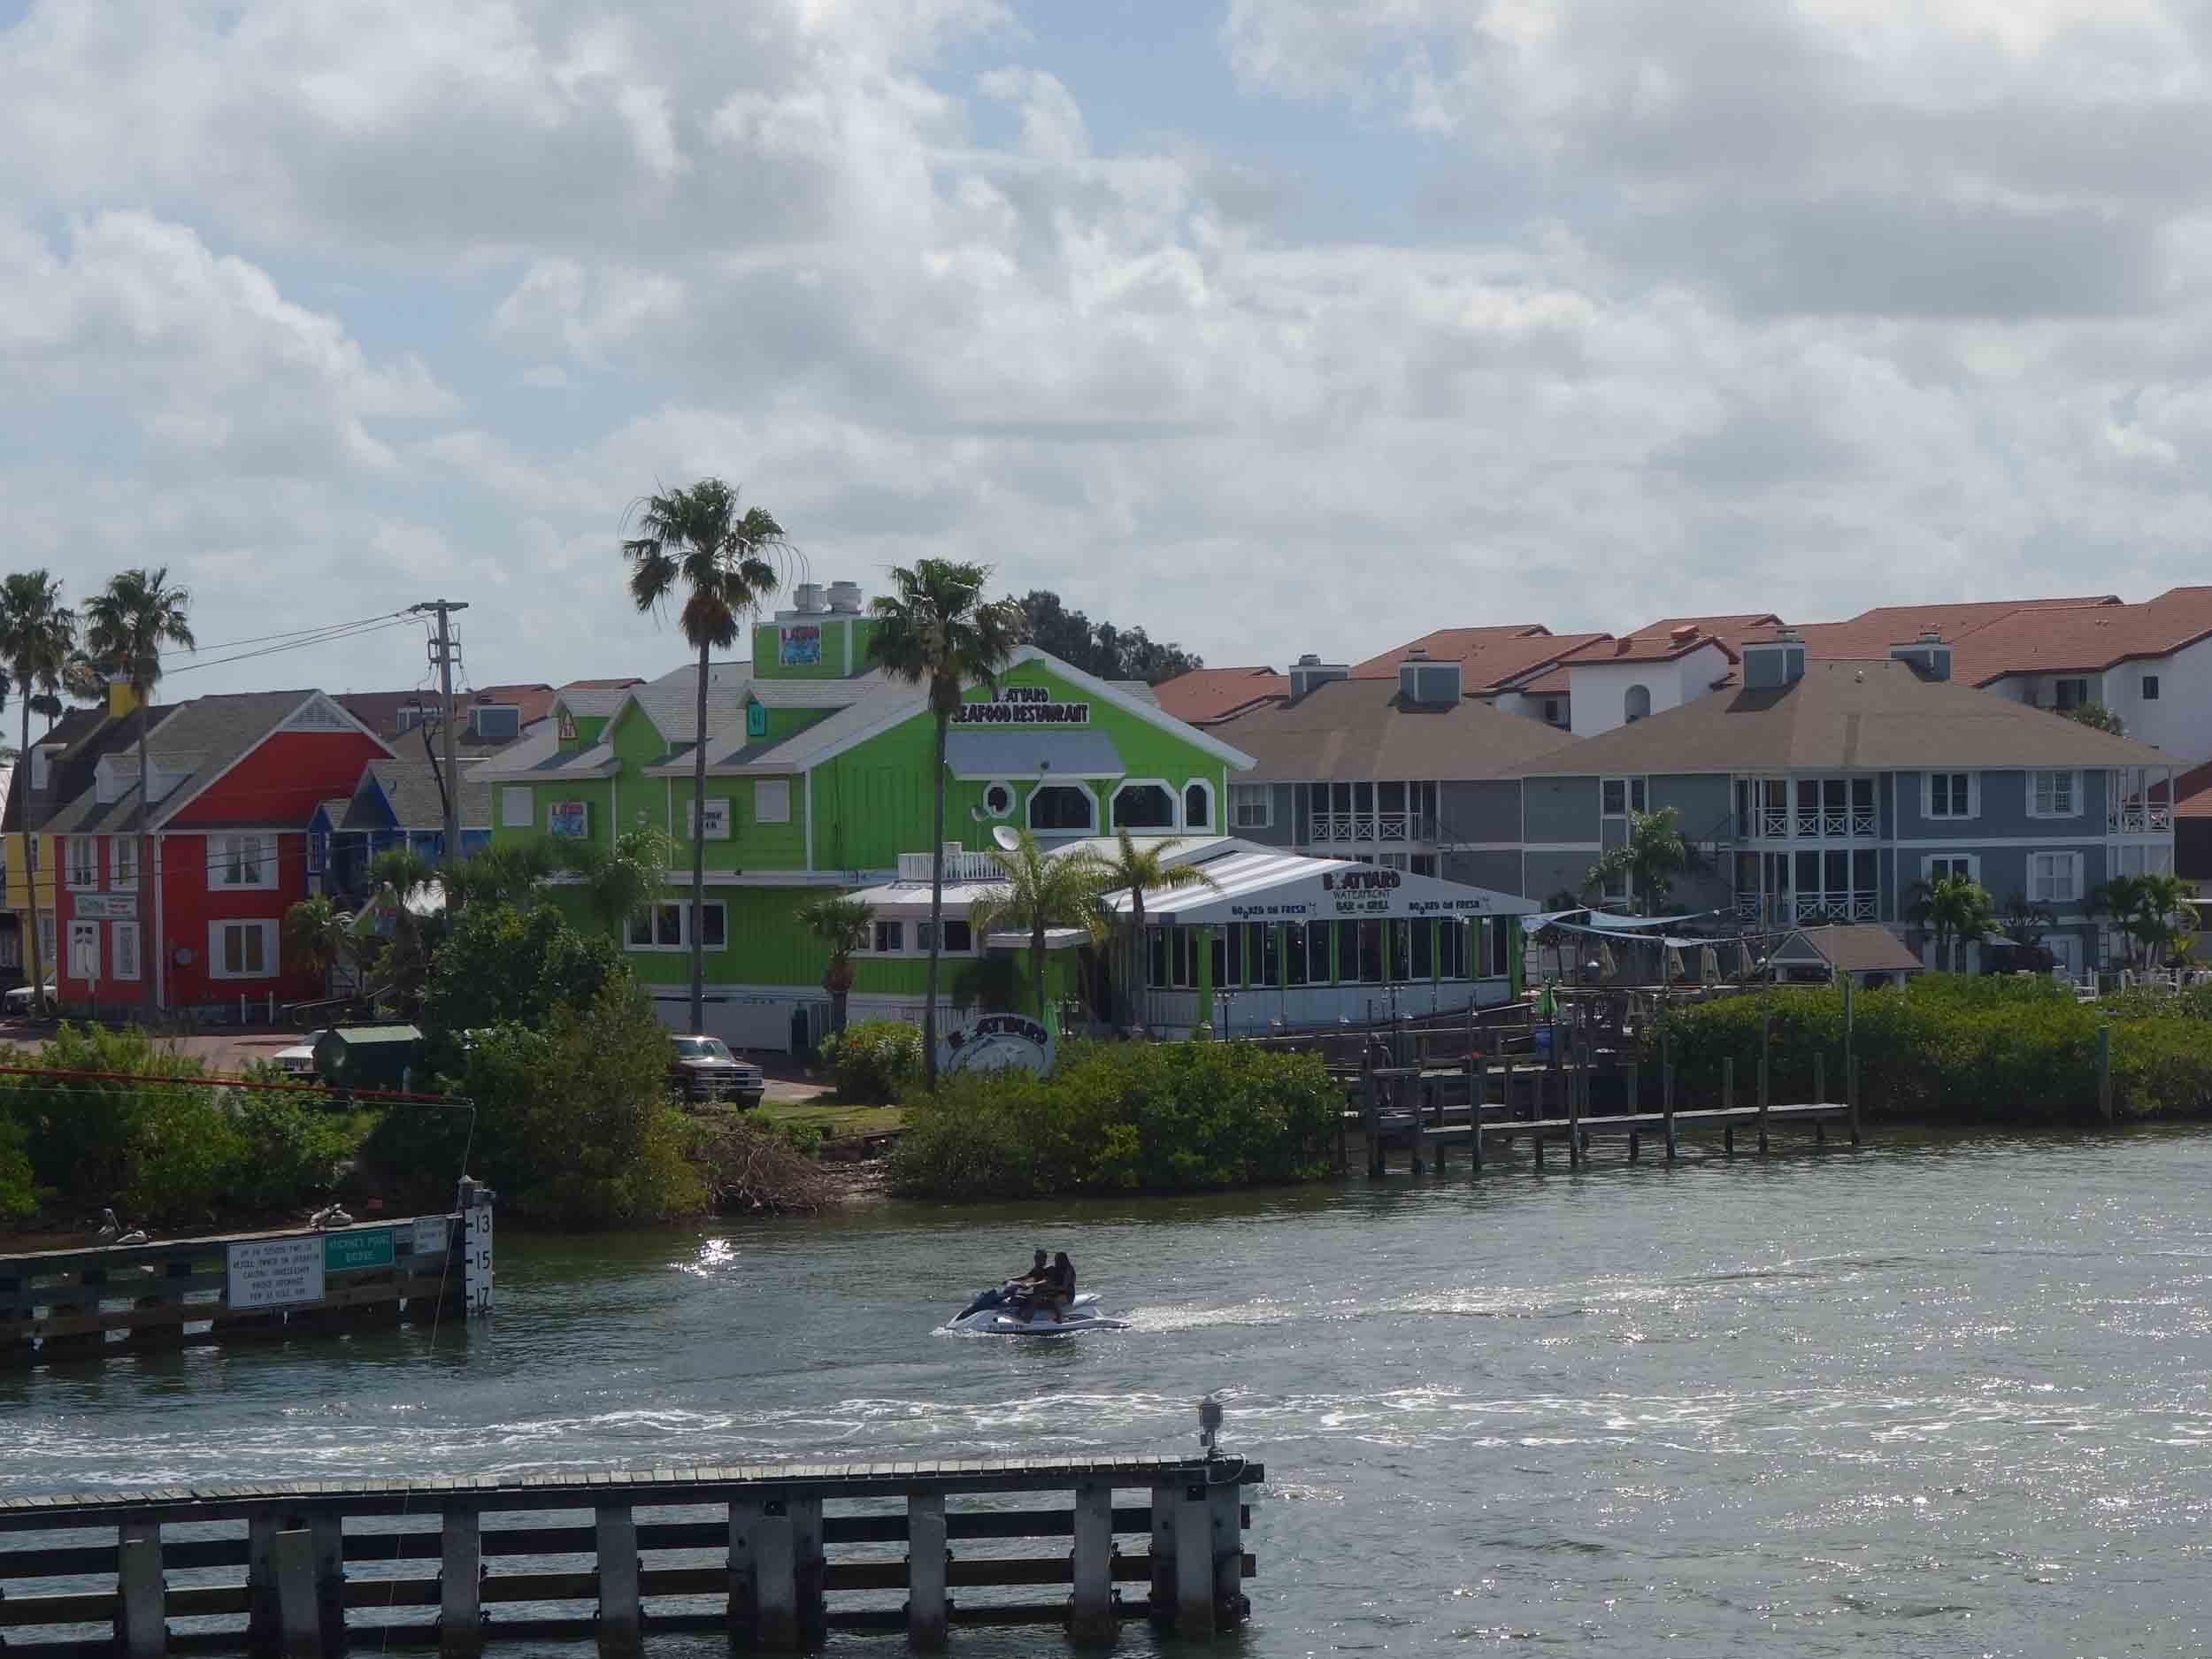 Boatyard Waterfront Bar and Grill Exterior